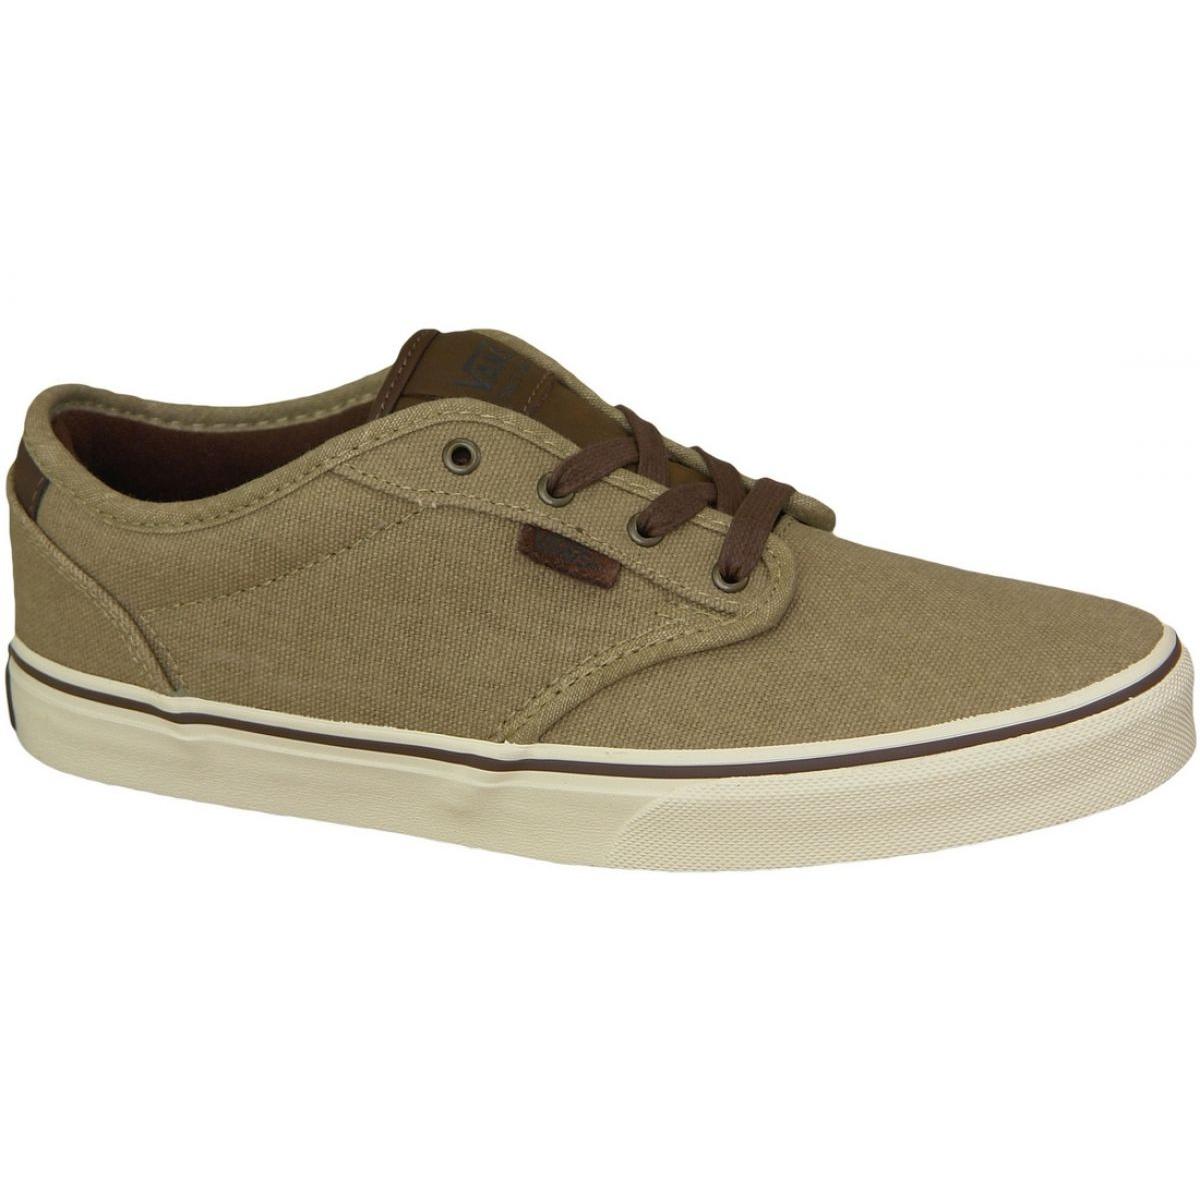 Vans Atwood Deluxe W VZSTK6V shoes beige